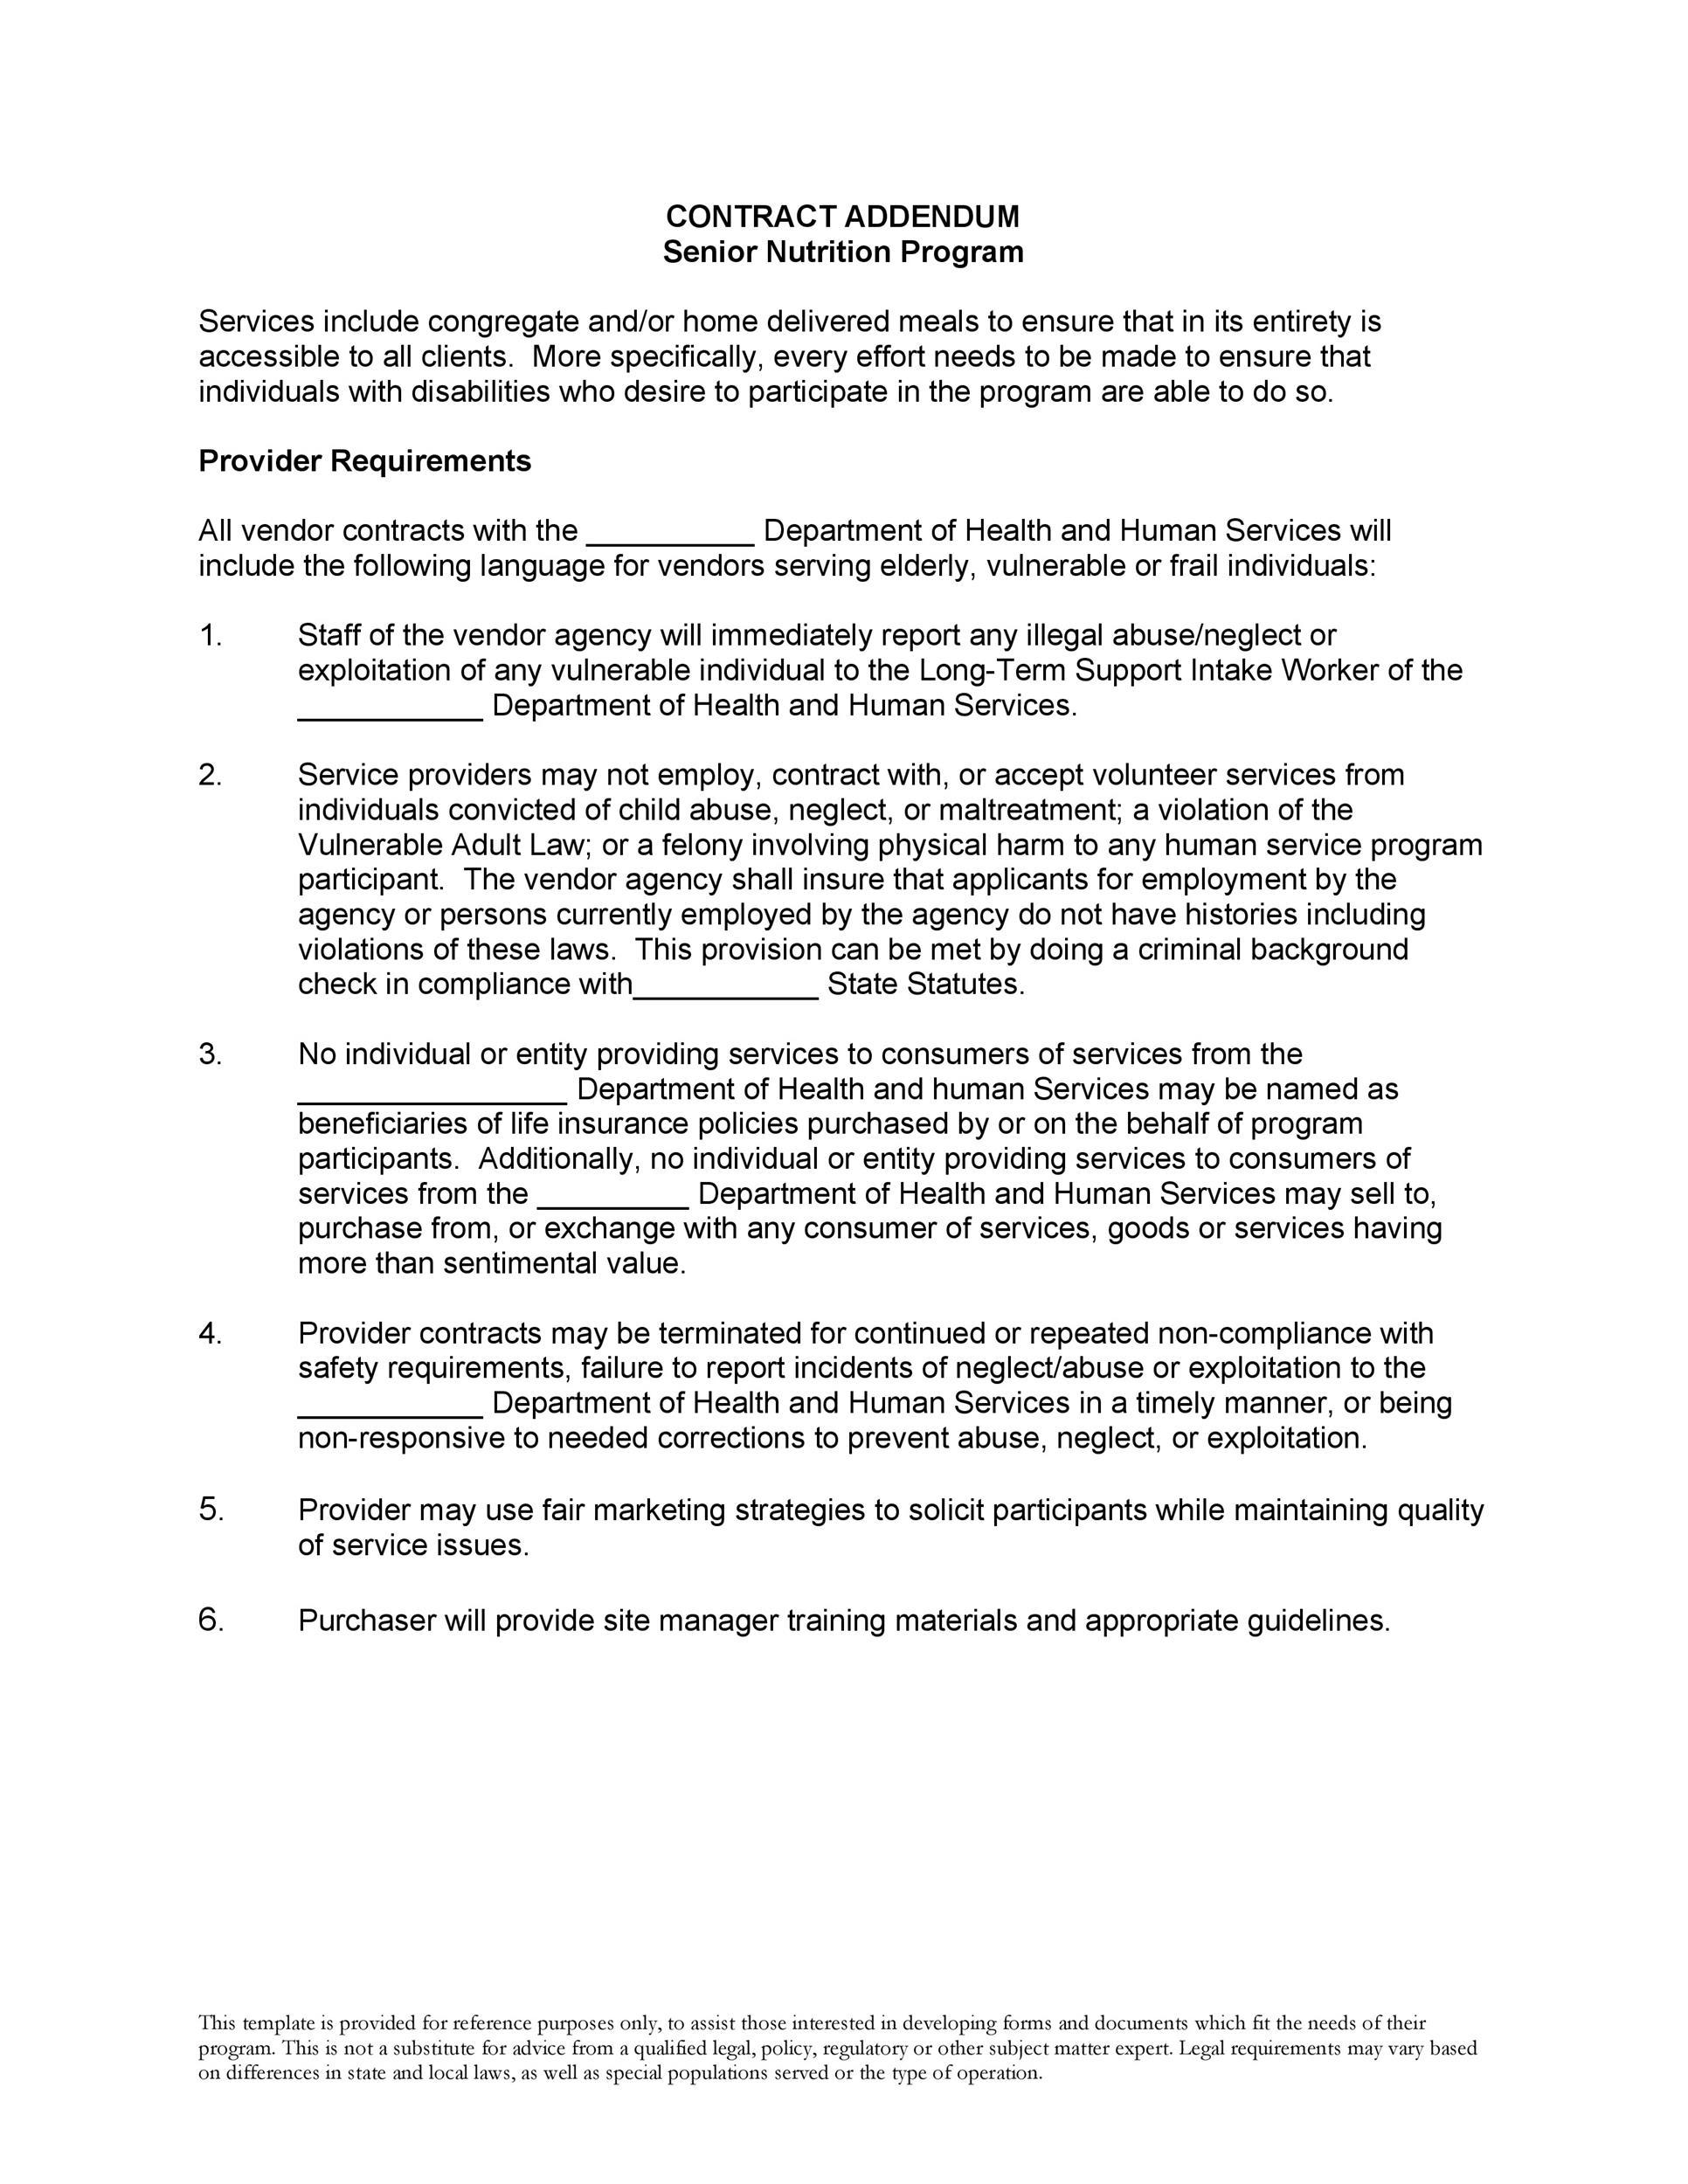 Free contract amendment 35